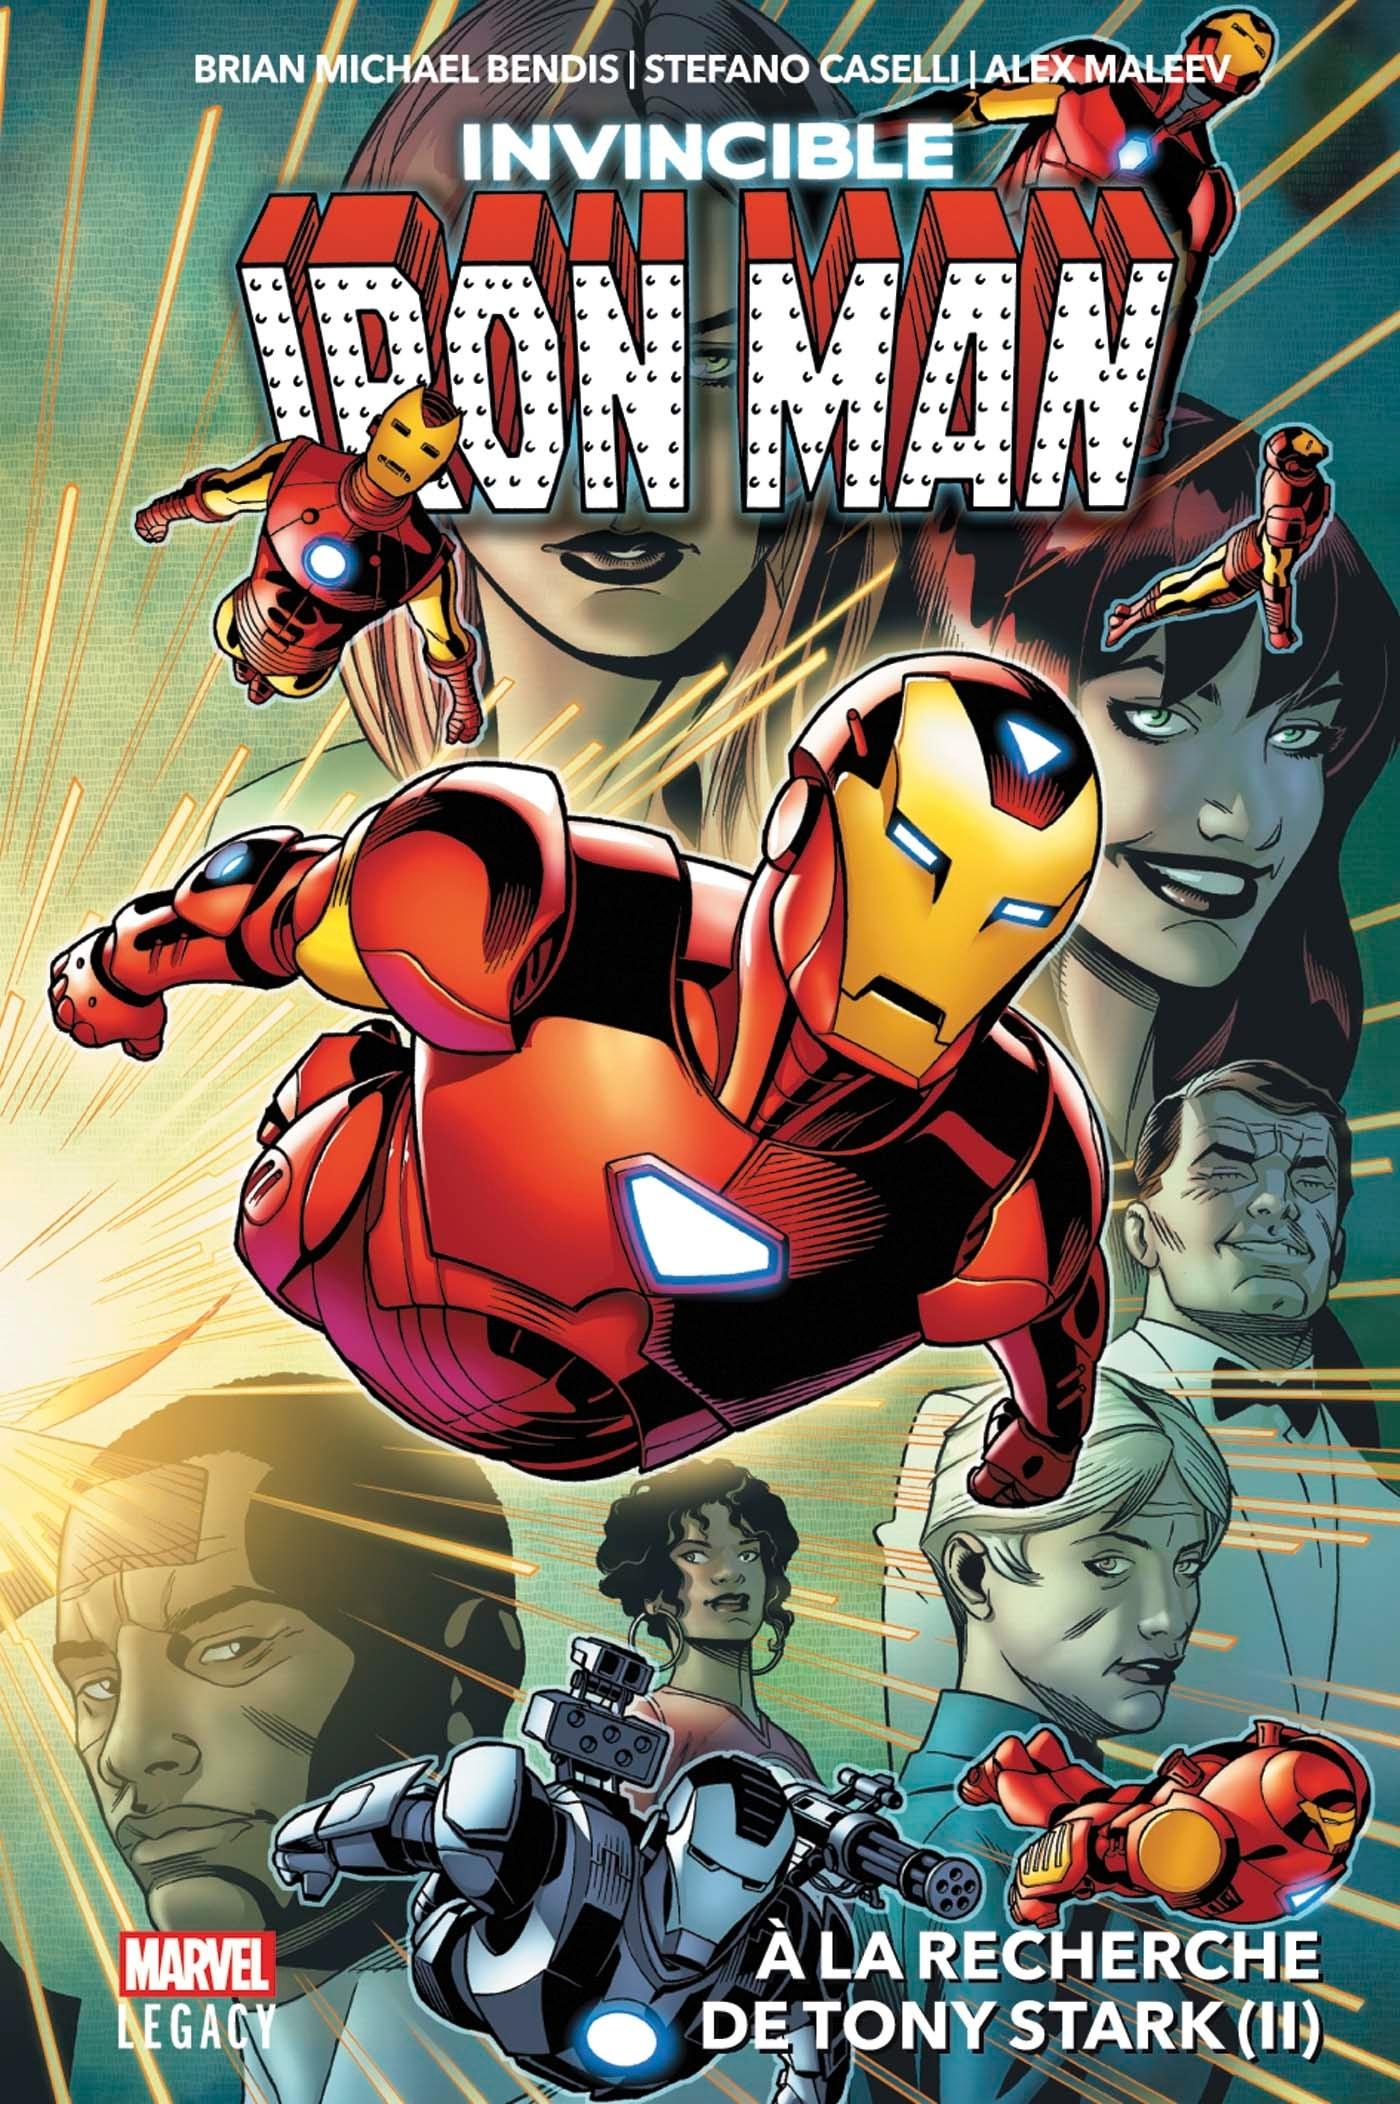 INVICIBLE IRON MAN T02 : A LA RECHERCHE DE TONY STARK (II)